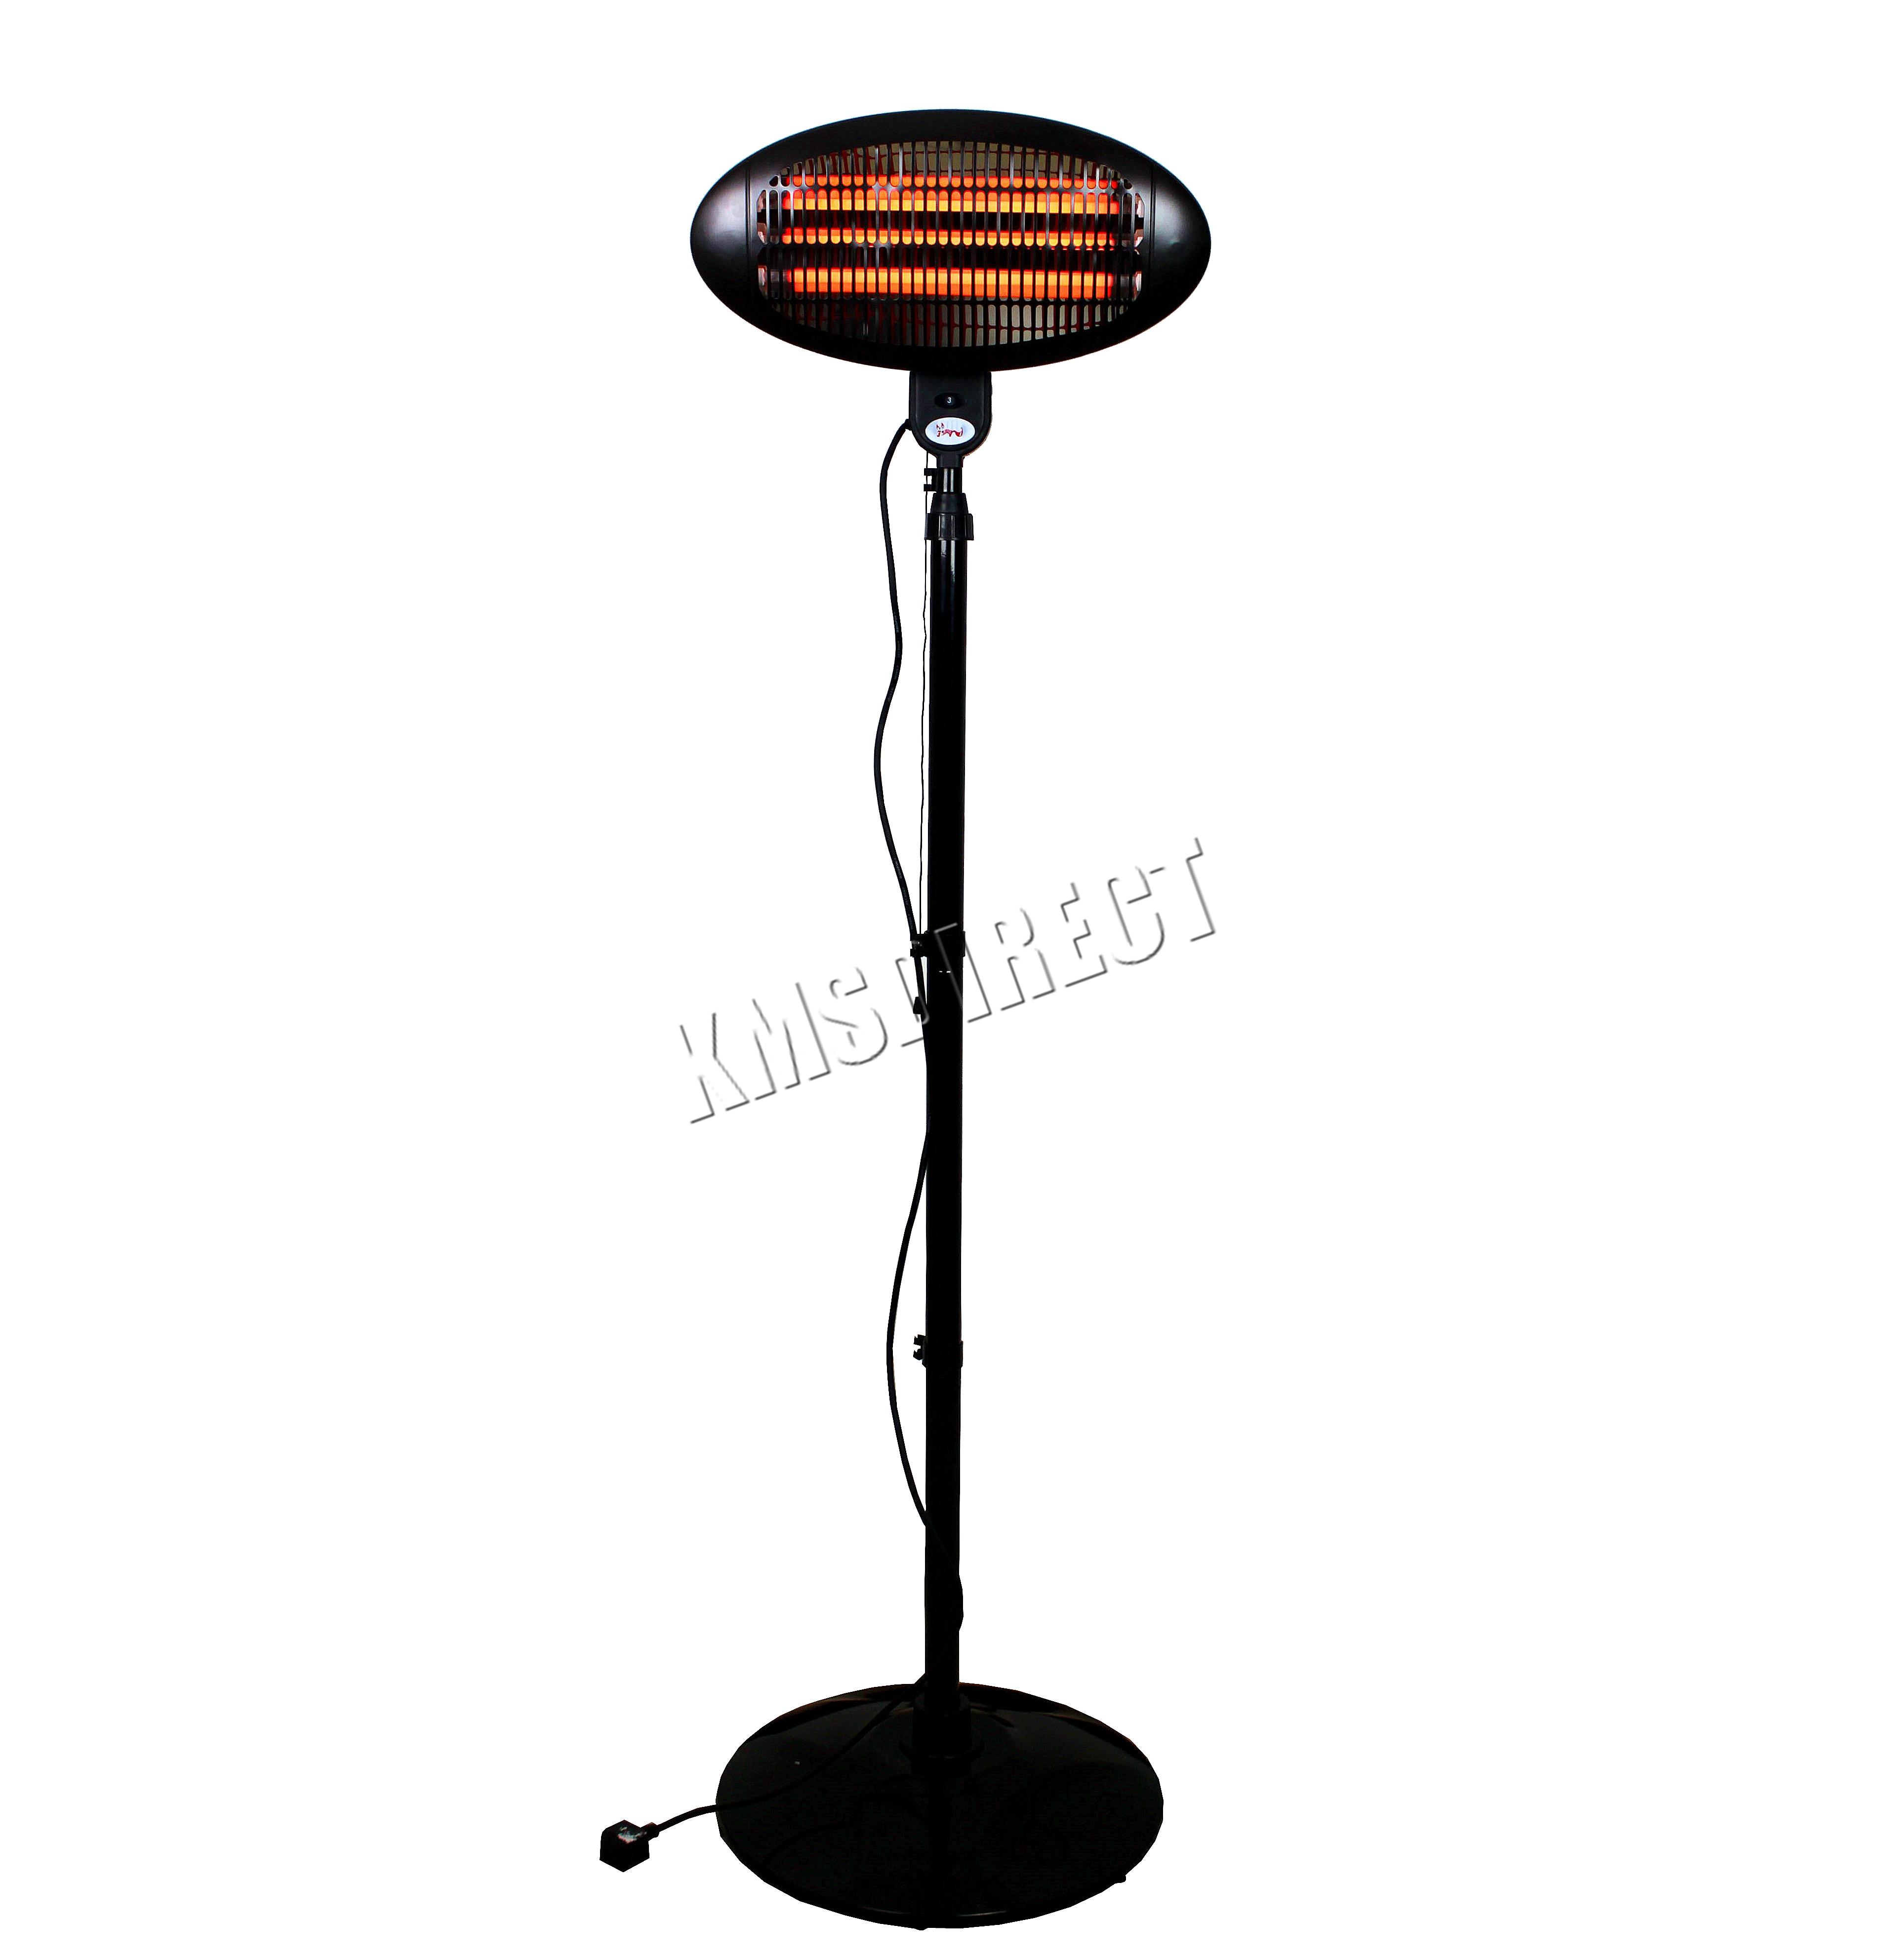 Foxhunter Garden Outdoor Quartz 2kw Electric Patio Heater